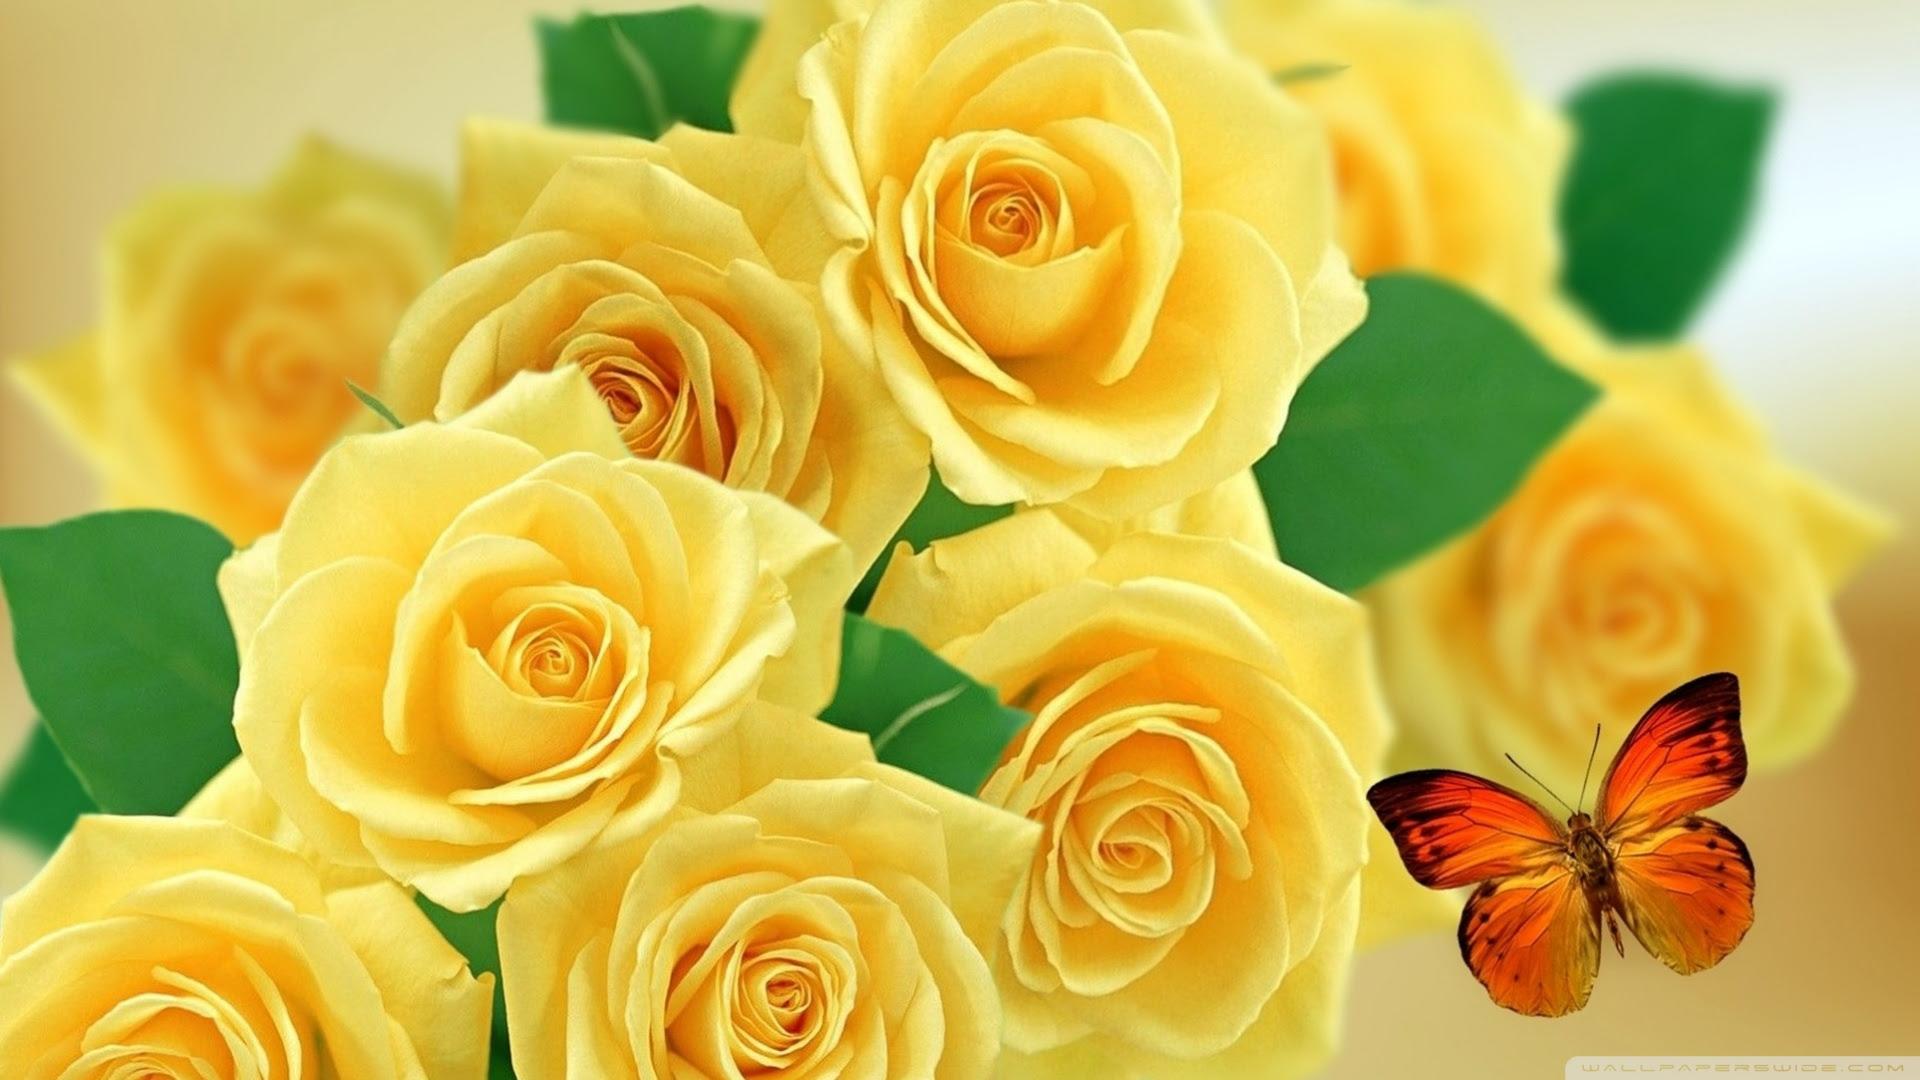 Hd Yellow Rose Wallpaper